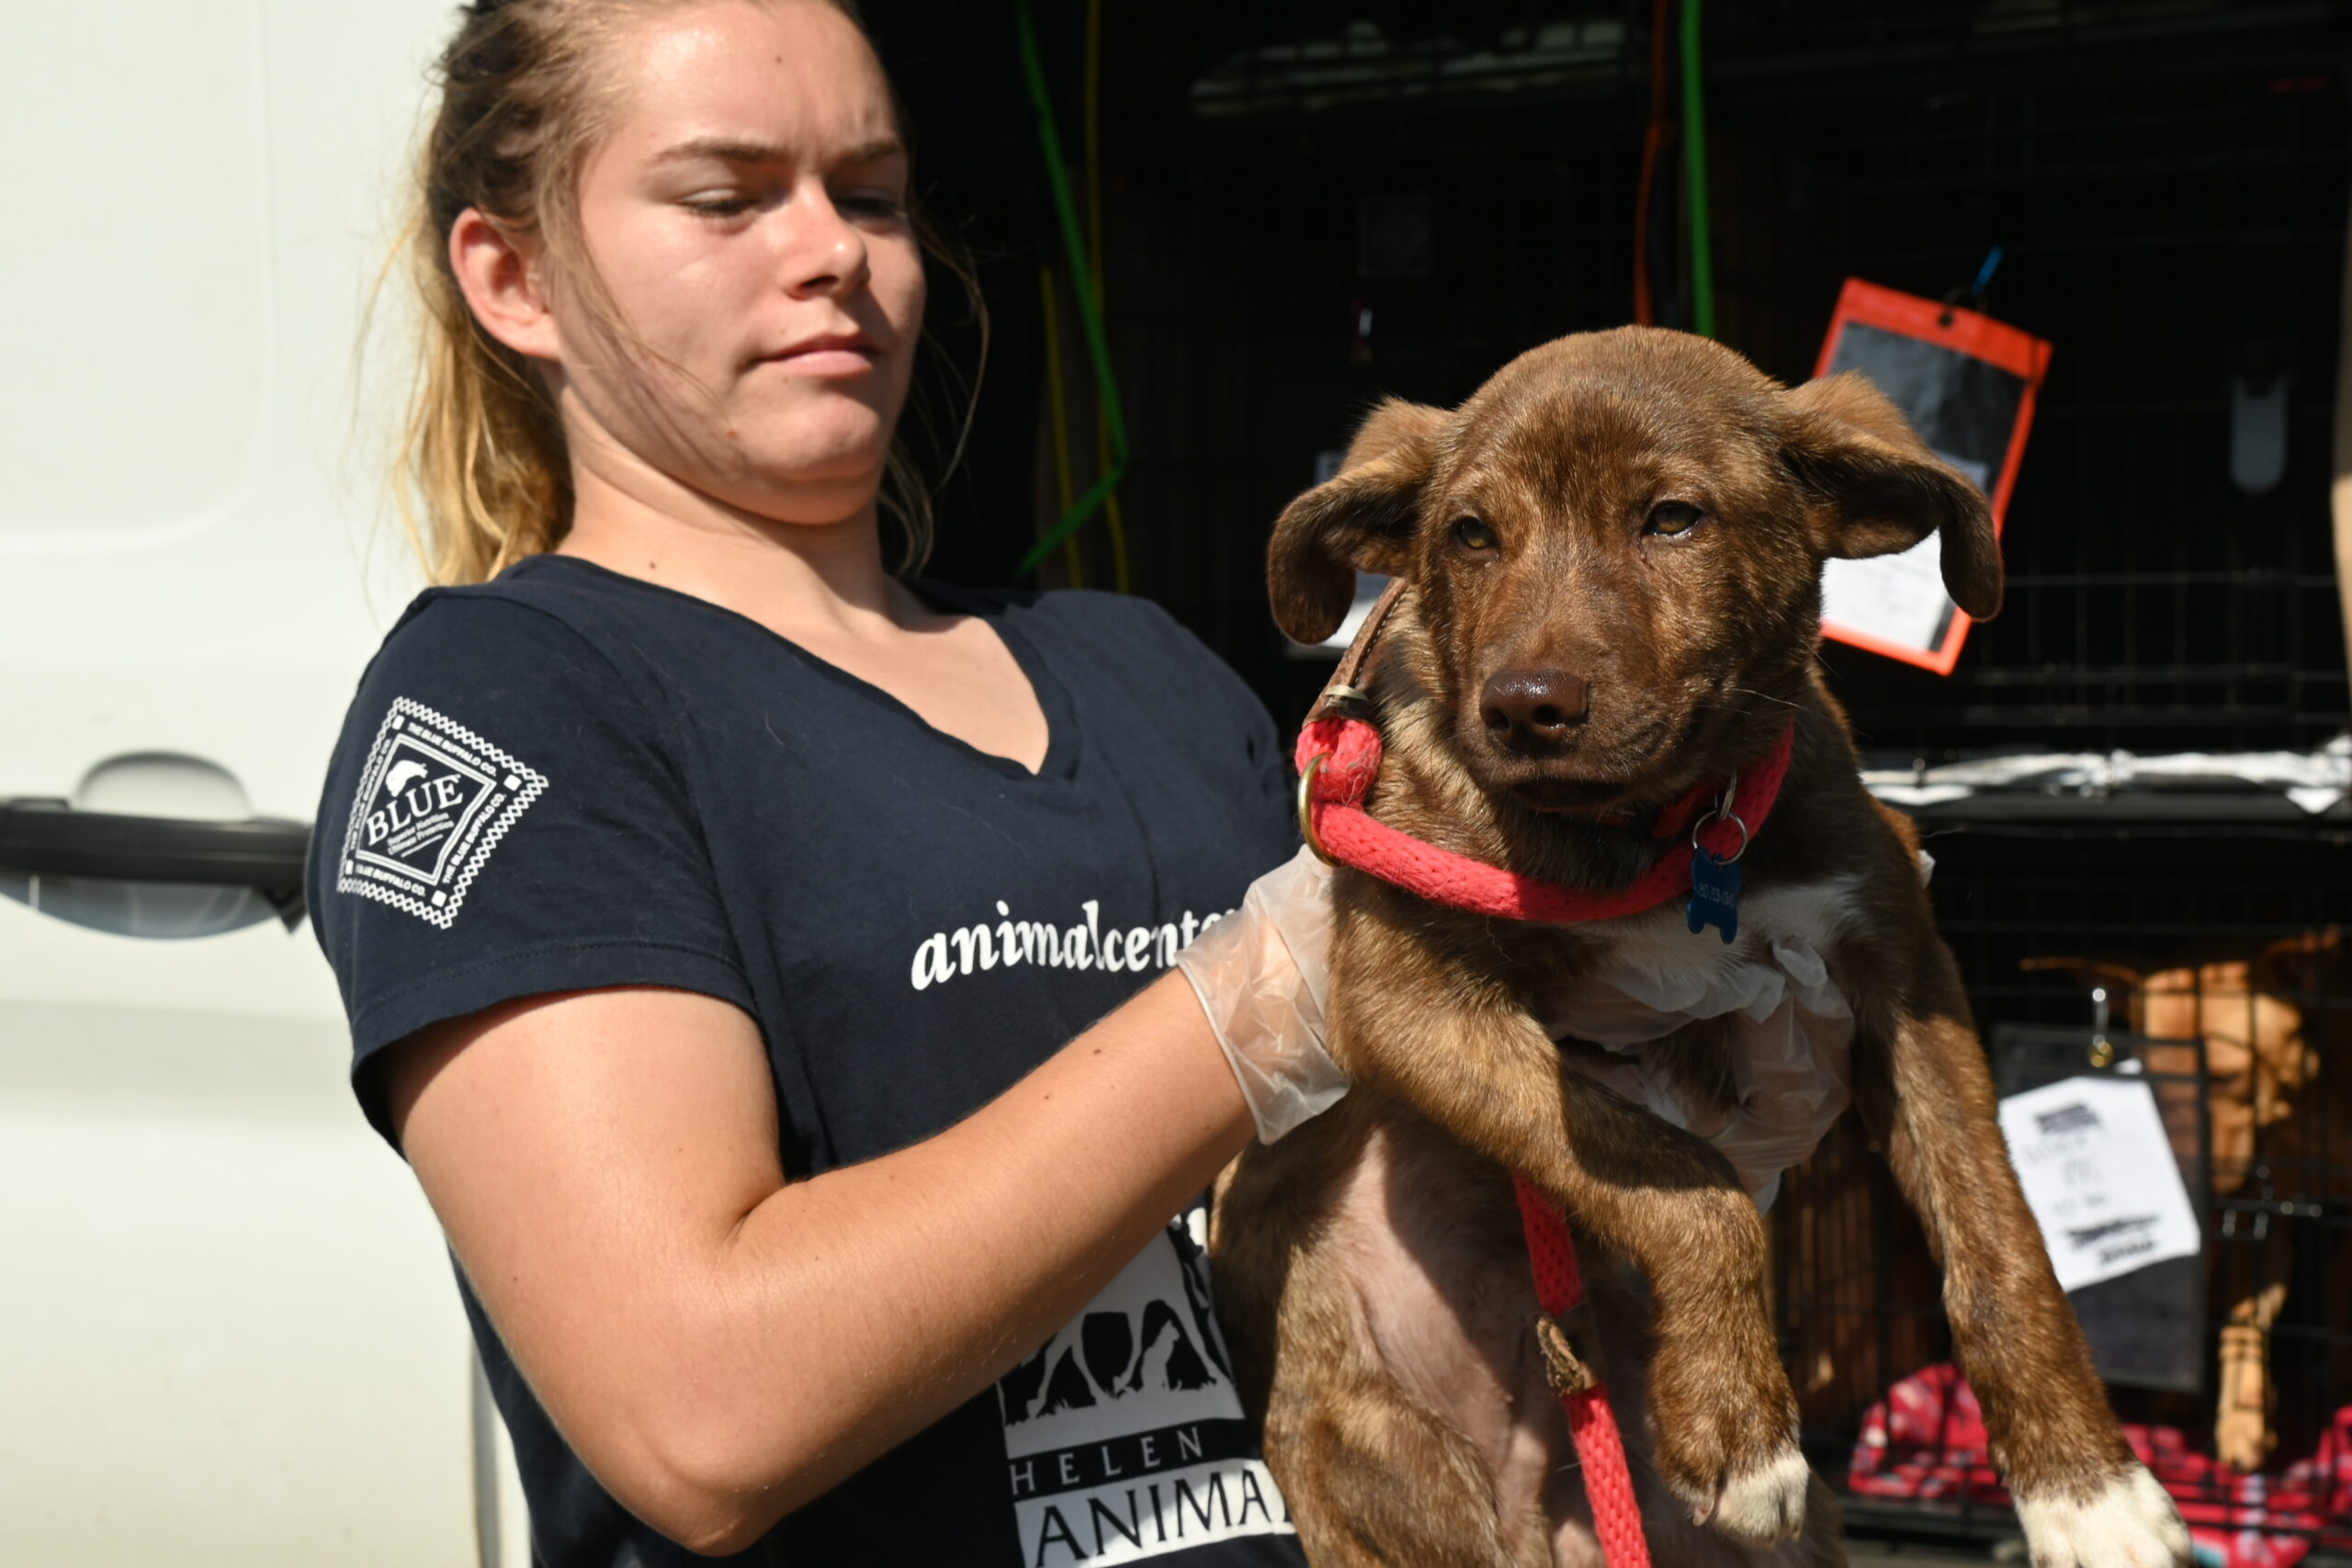 Dog gets off-loaded from van transport